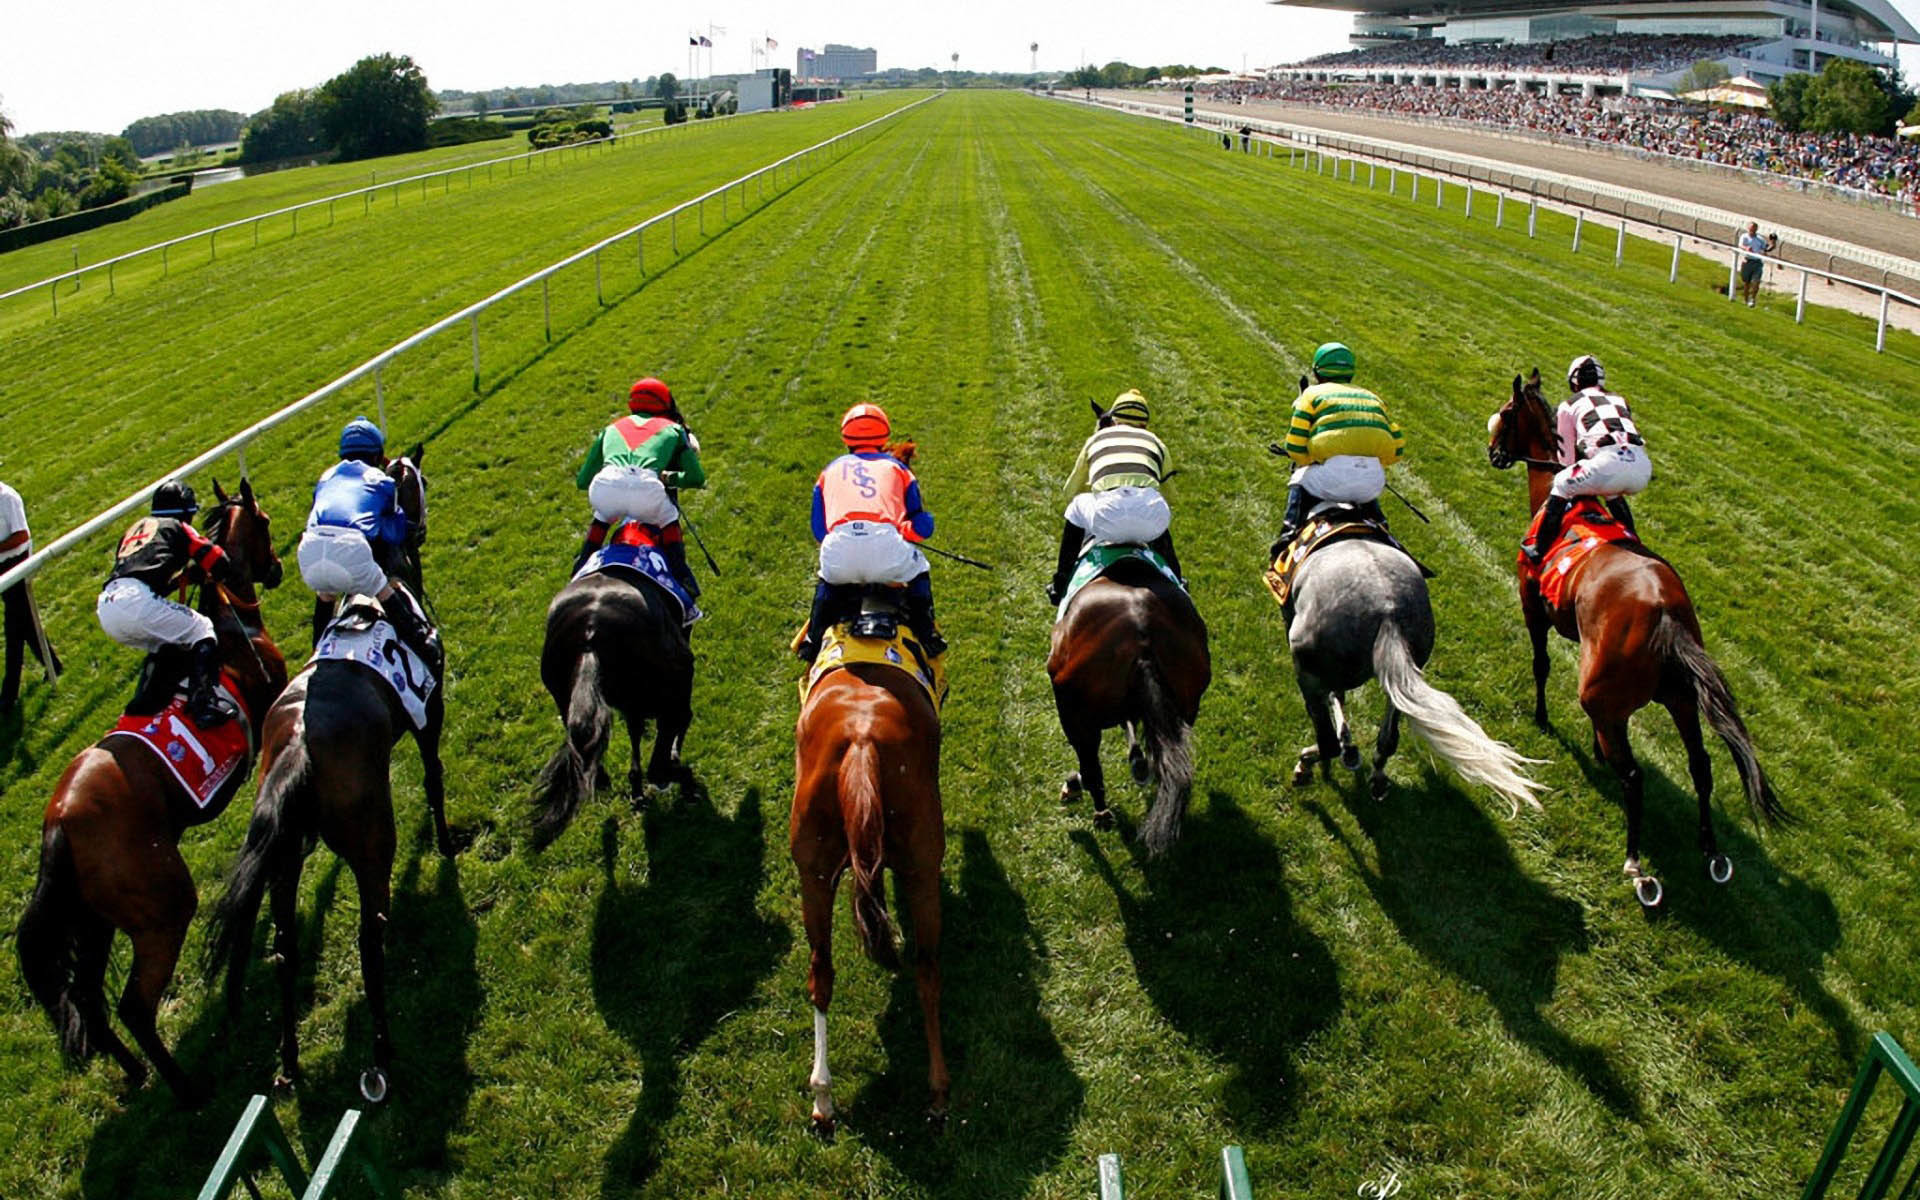 Horse Racing Wallpaper 183 ① Wallpapertag